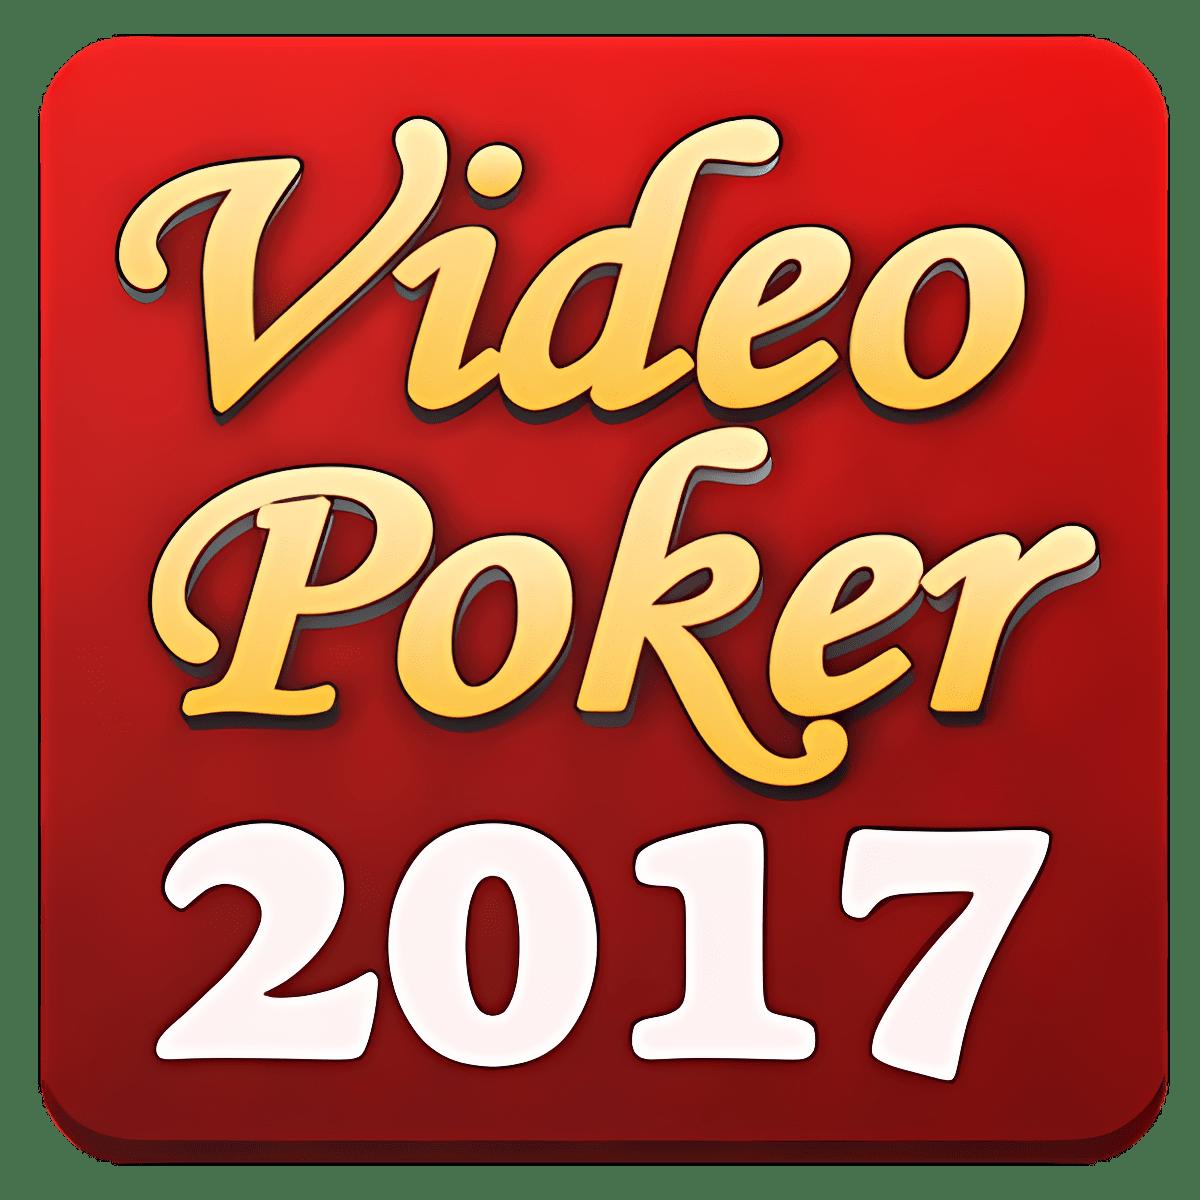 Video Poker 2017: Show hand 1.0.1